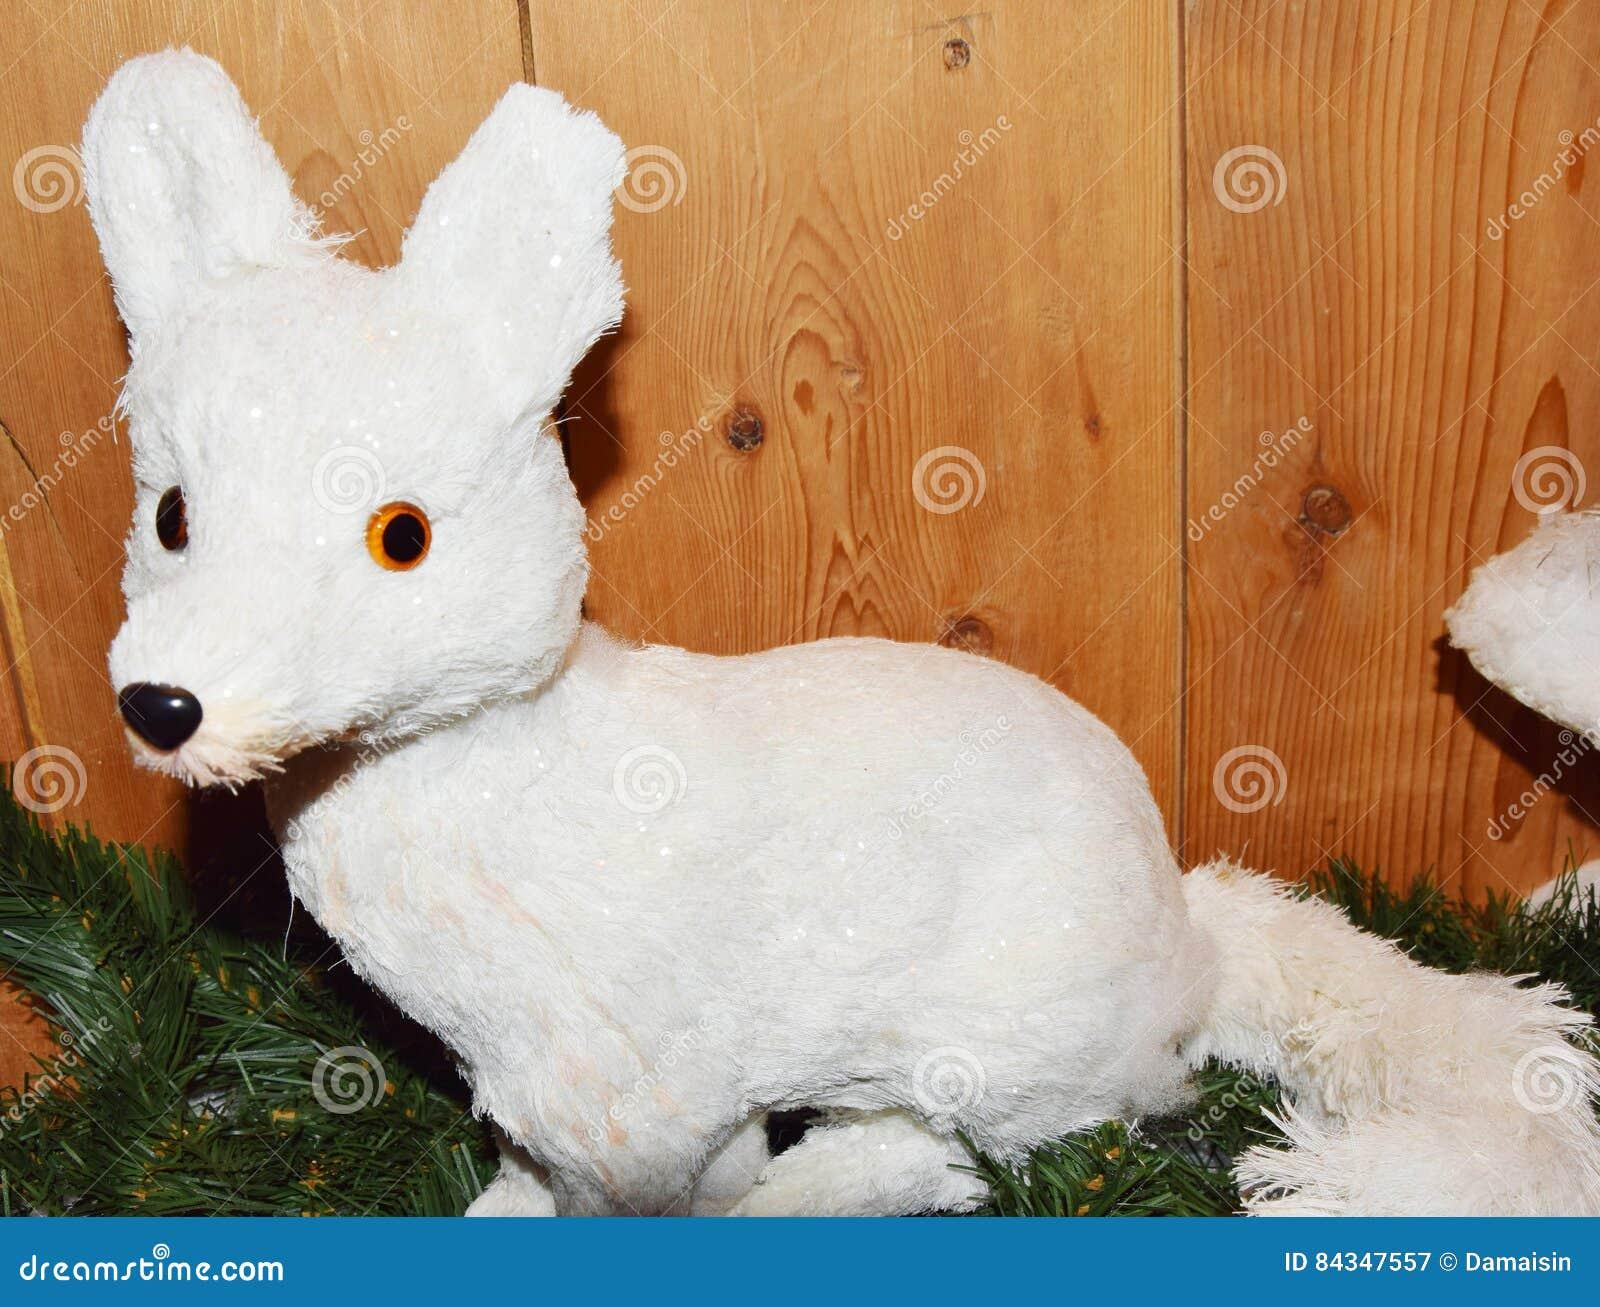 White Christmas Fox Stock Photo - Image: 84347557